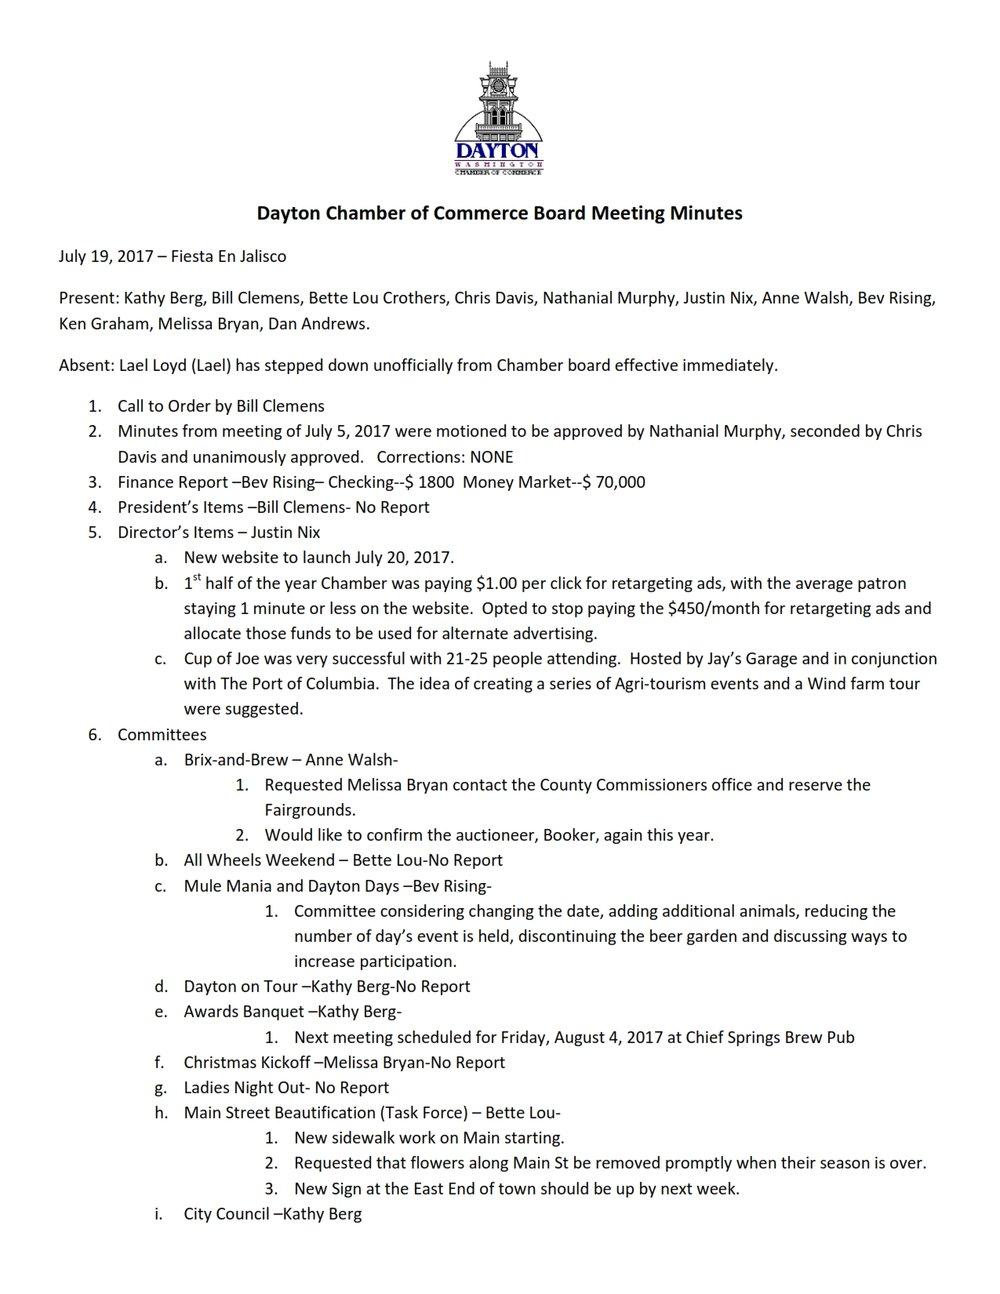 Minutes 7-19-2017_001.jpg